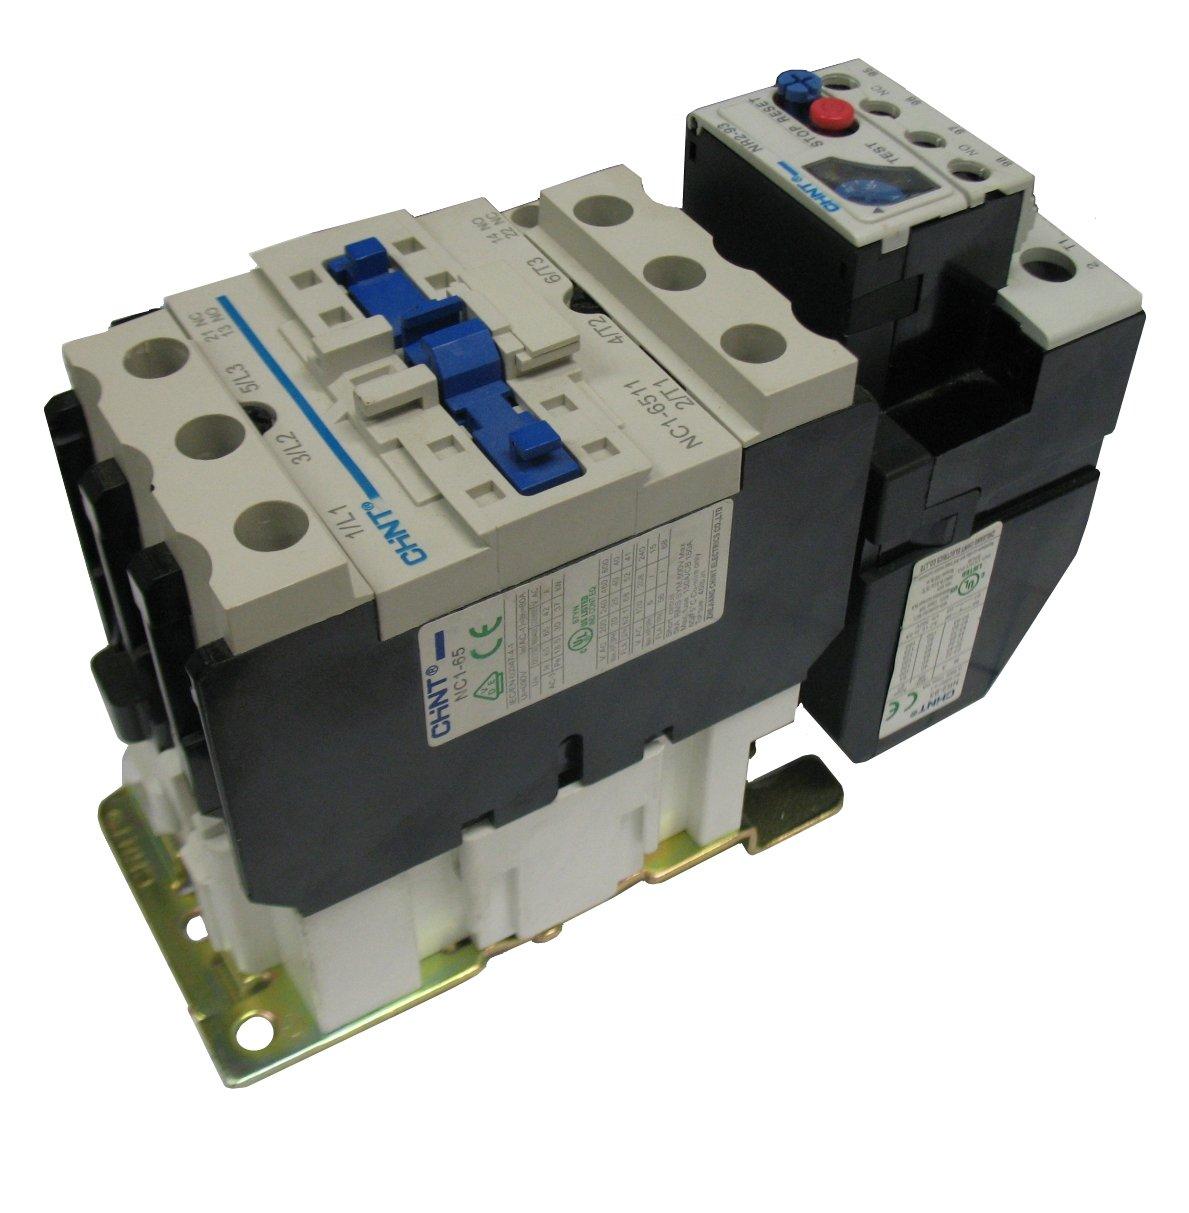 Telemecanique motor starter replacement lc1d lr2d1 50 hp for 50 hp motor starter